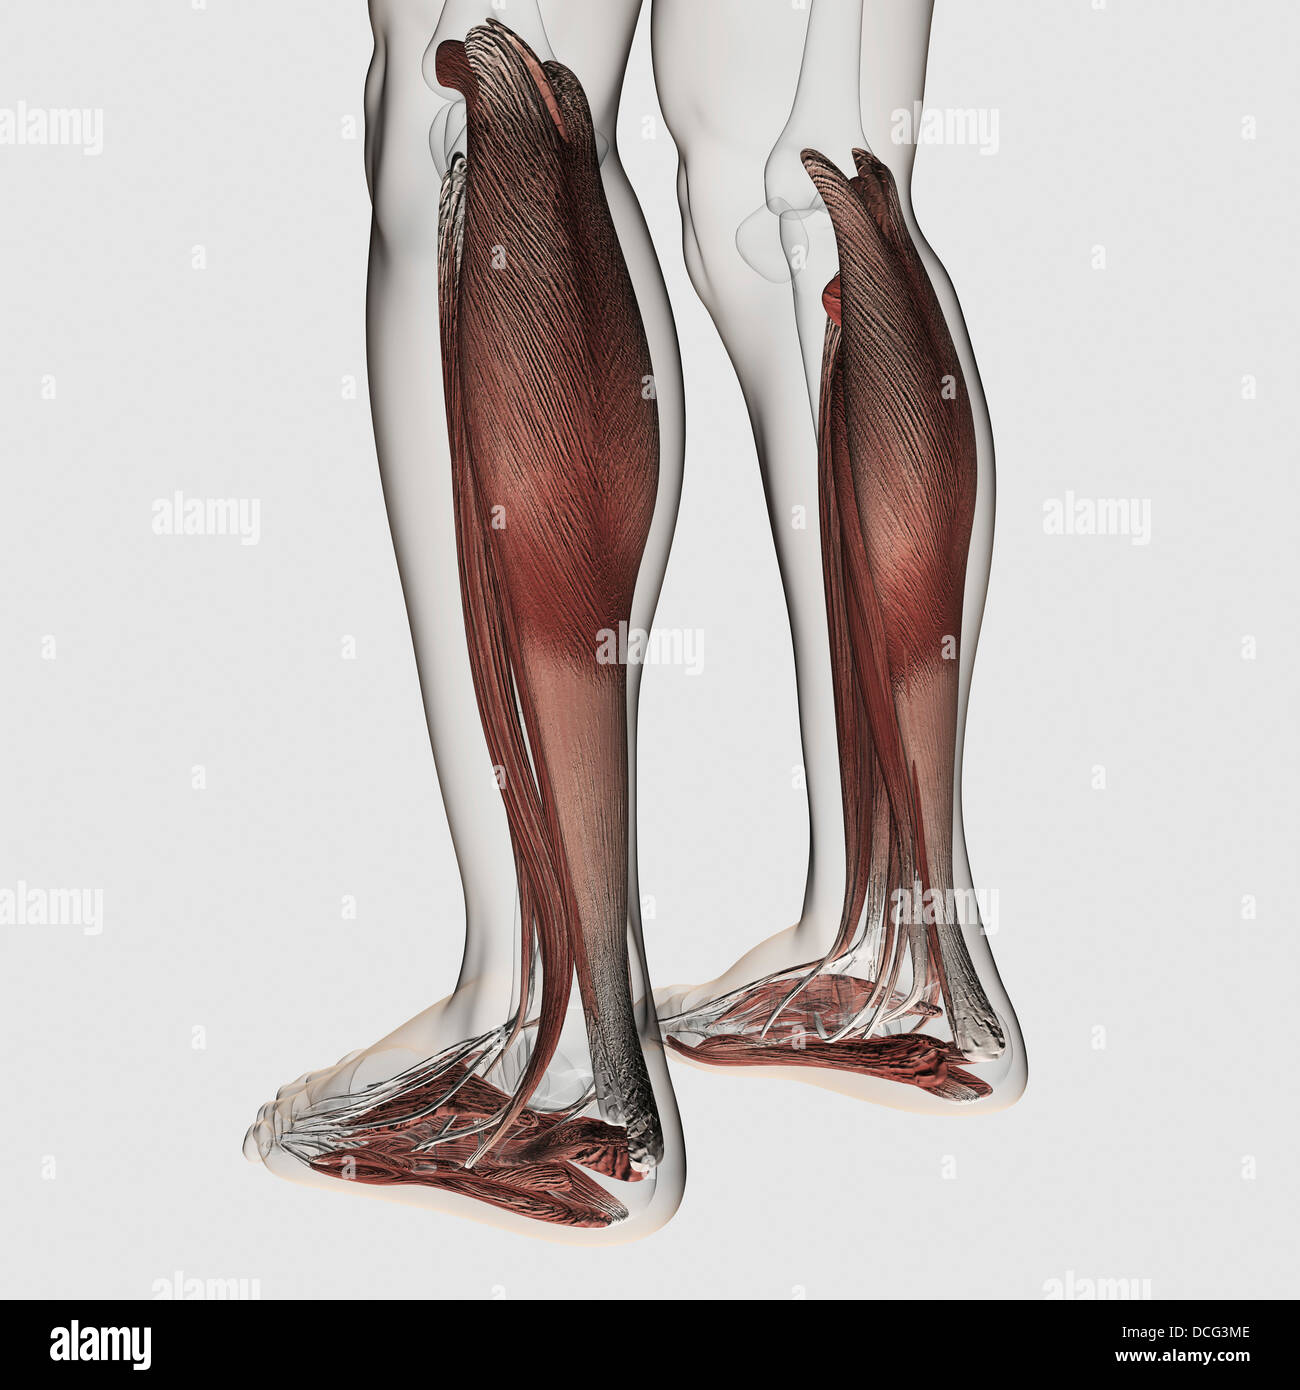 Fibularis Longus Stockfotos & Fibularis Longus Bilder - Alamy